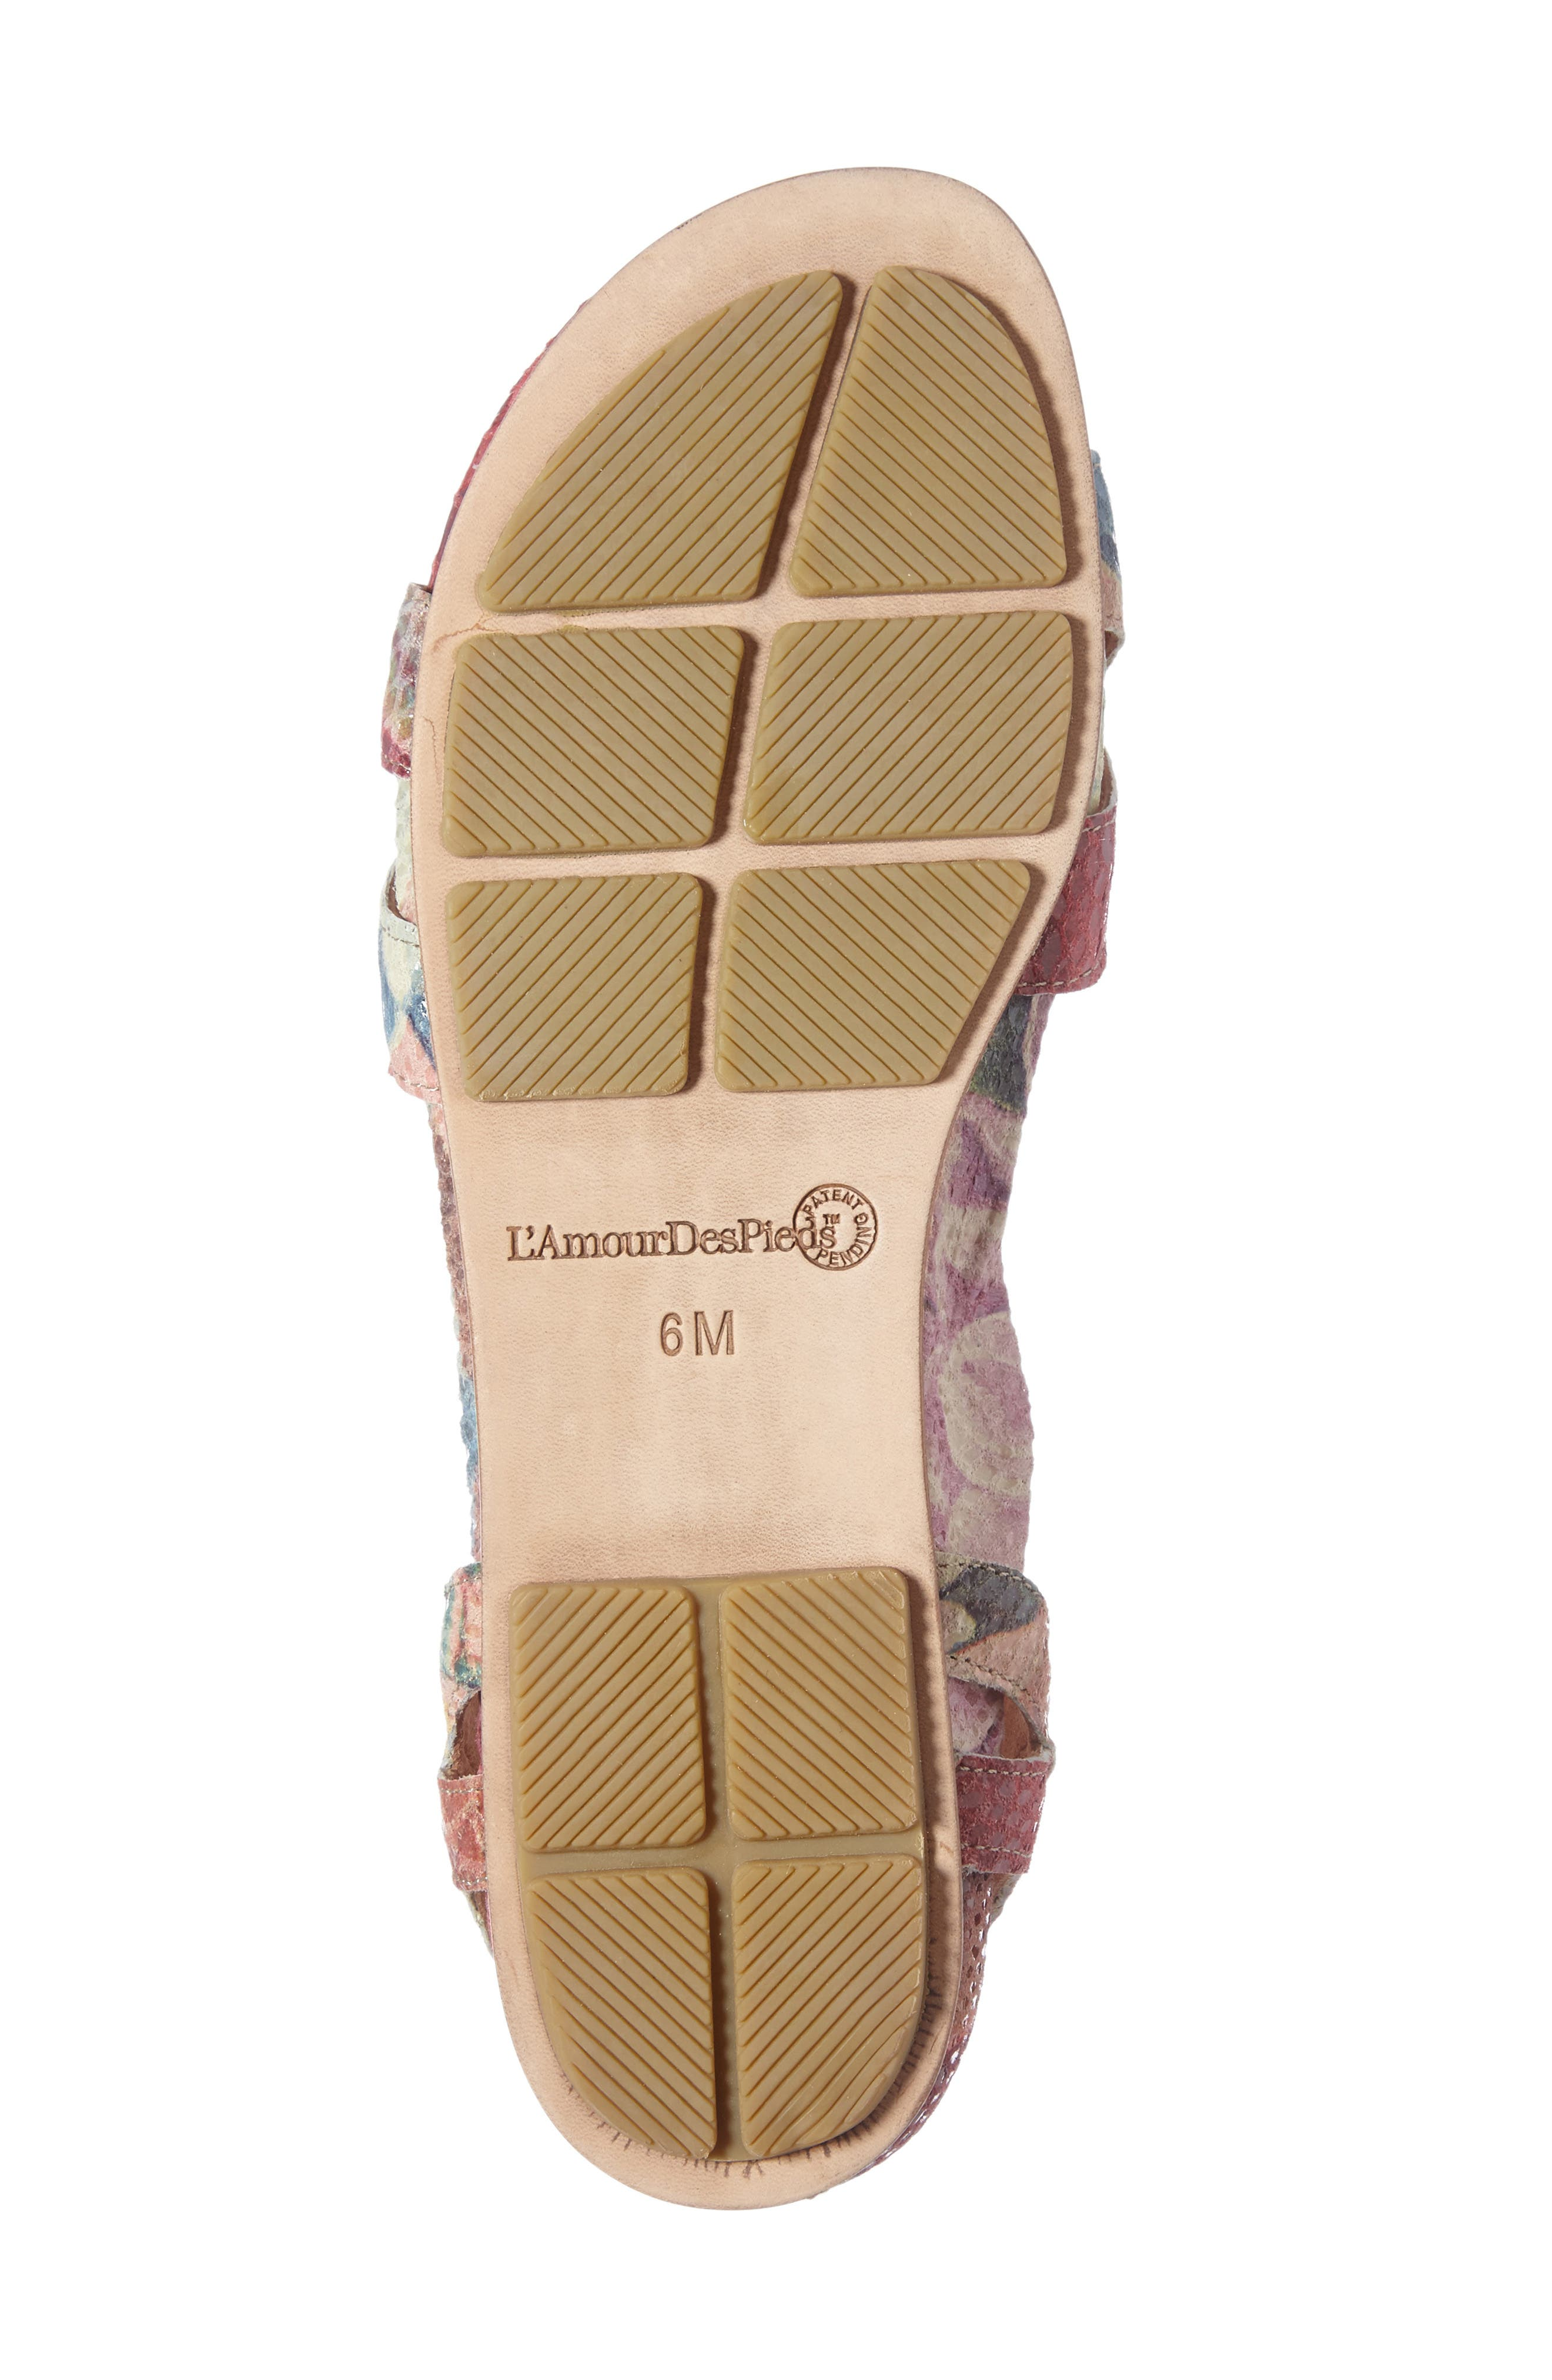 Darrylynn Wraparound Lace-Up Sandal,                             Alternate thumbnail 8, color,